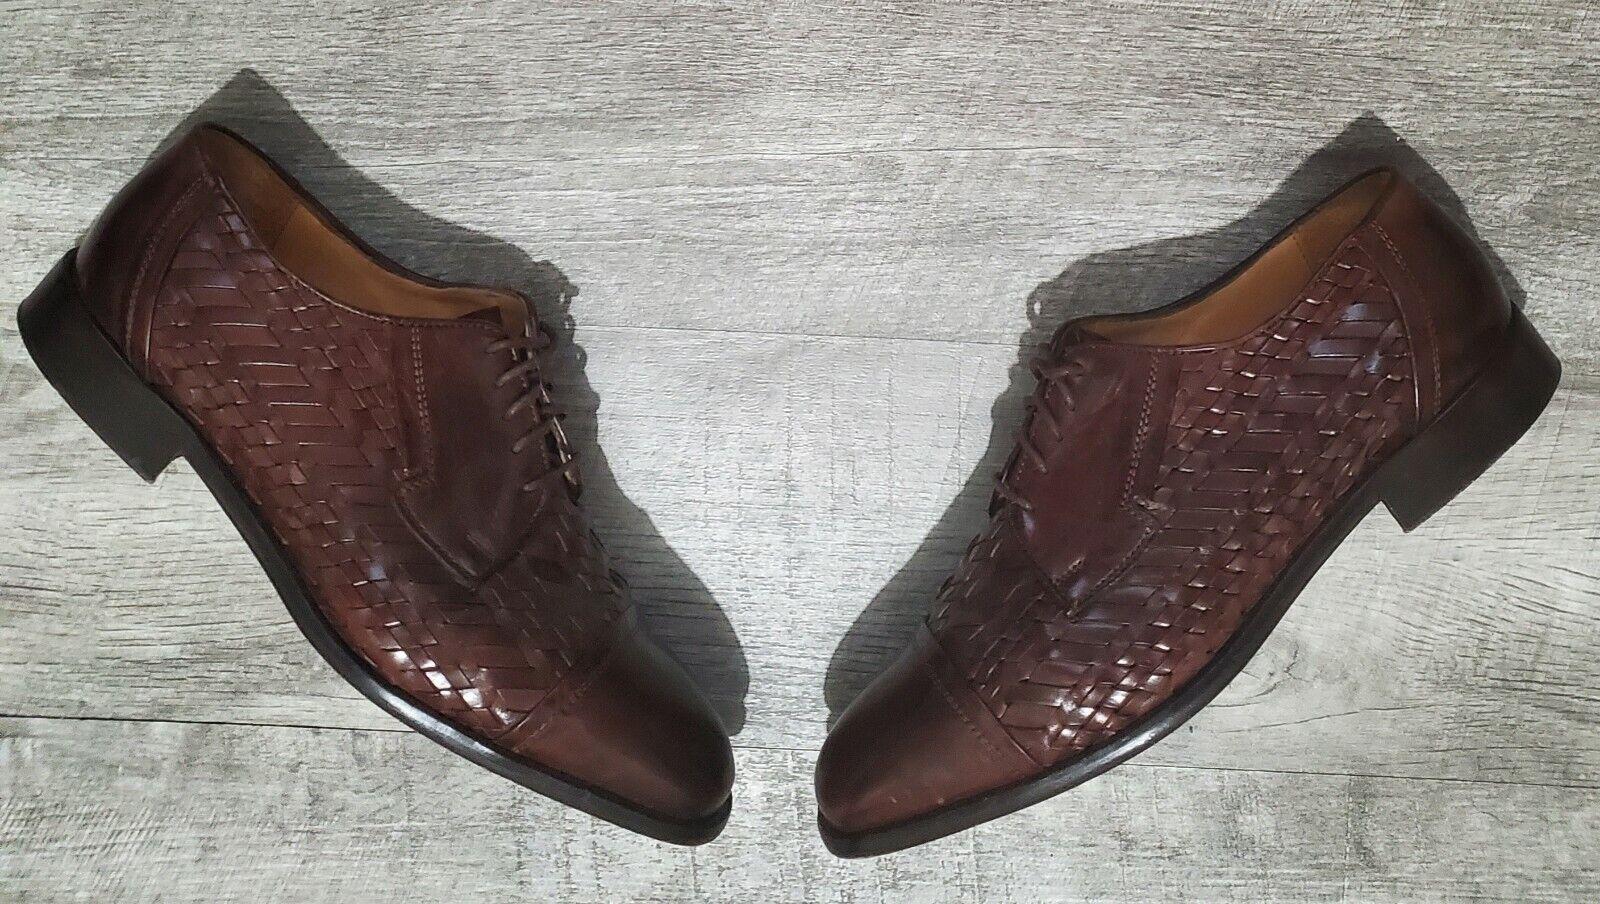 Johnston Murphy Cellini Woven Brown Leather Oxford Shoes Cap Toe Men's 10 M